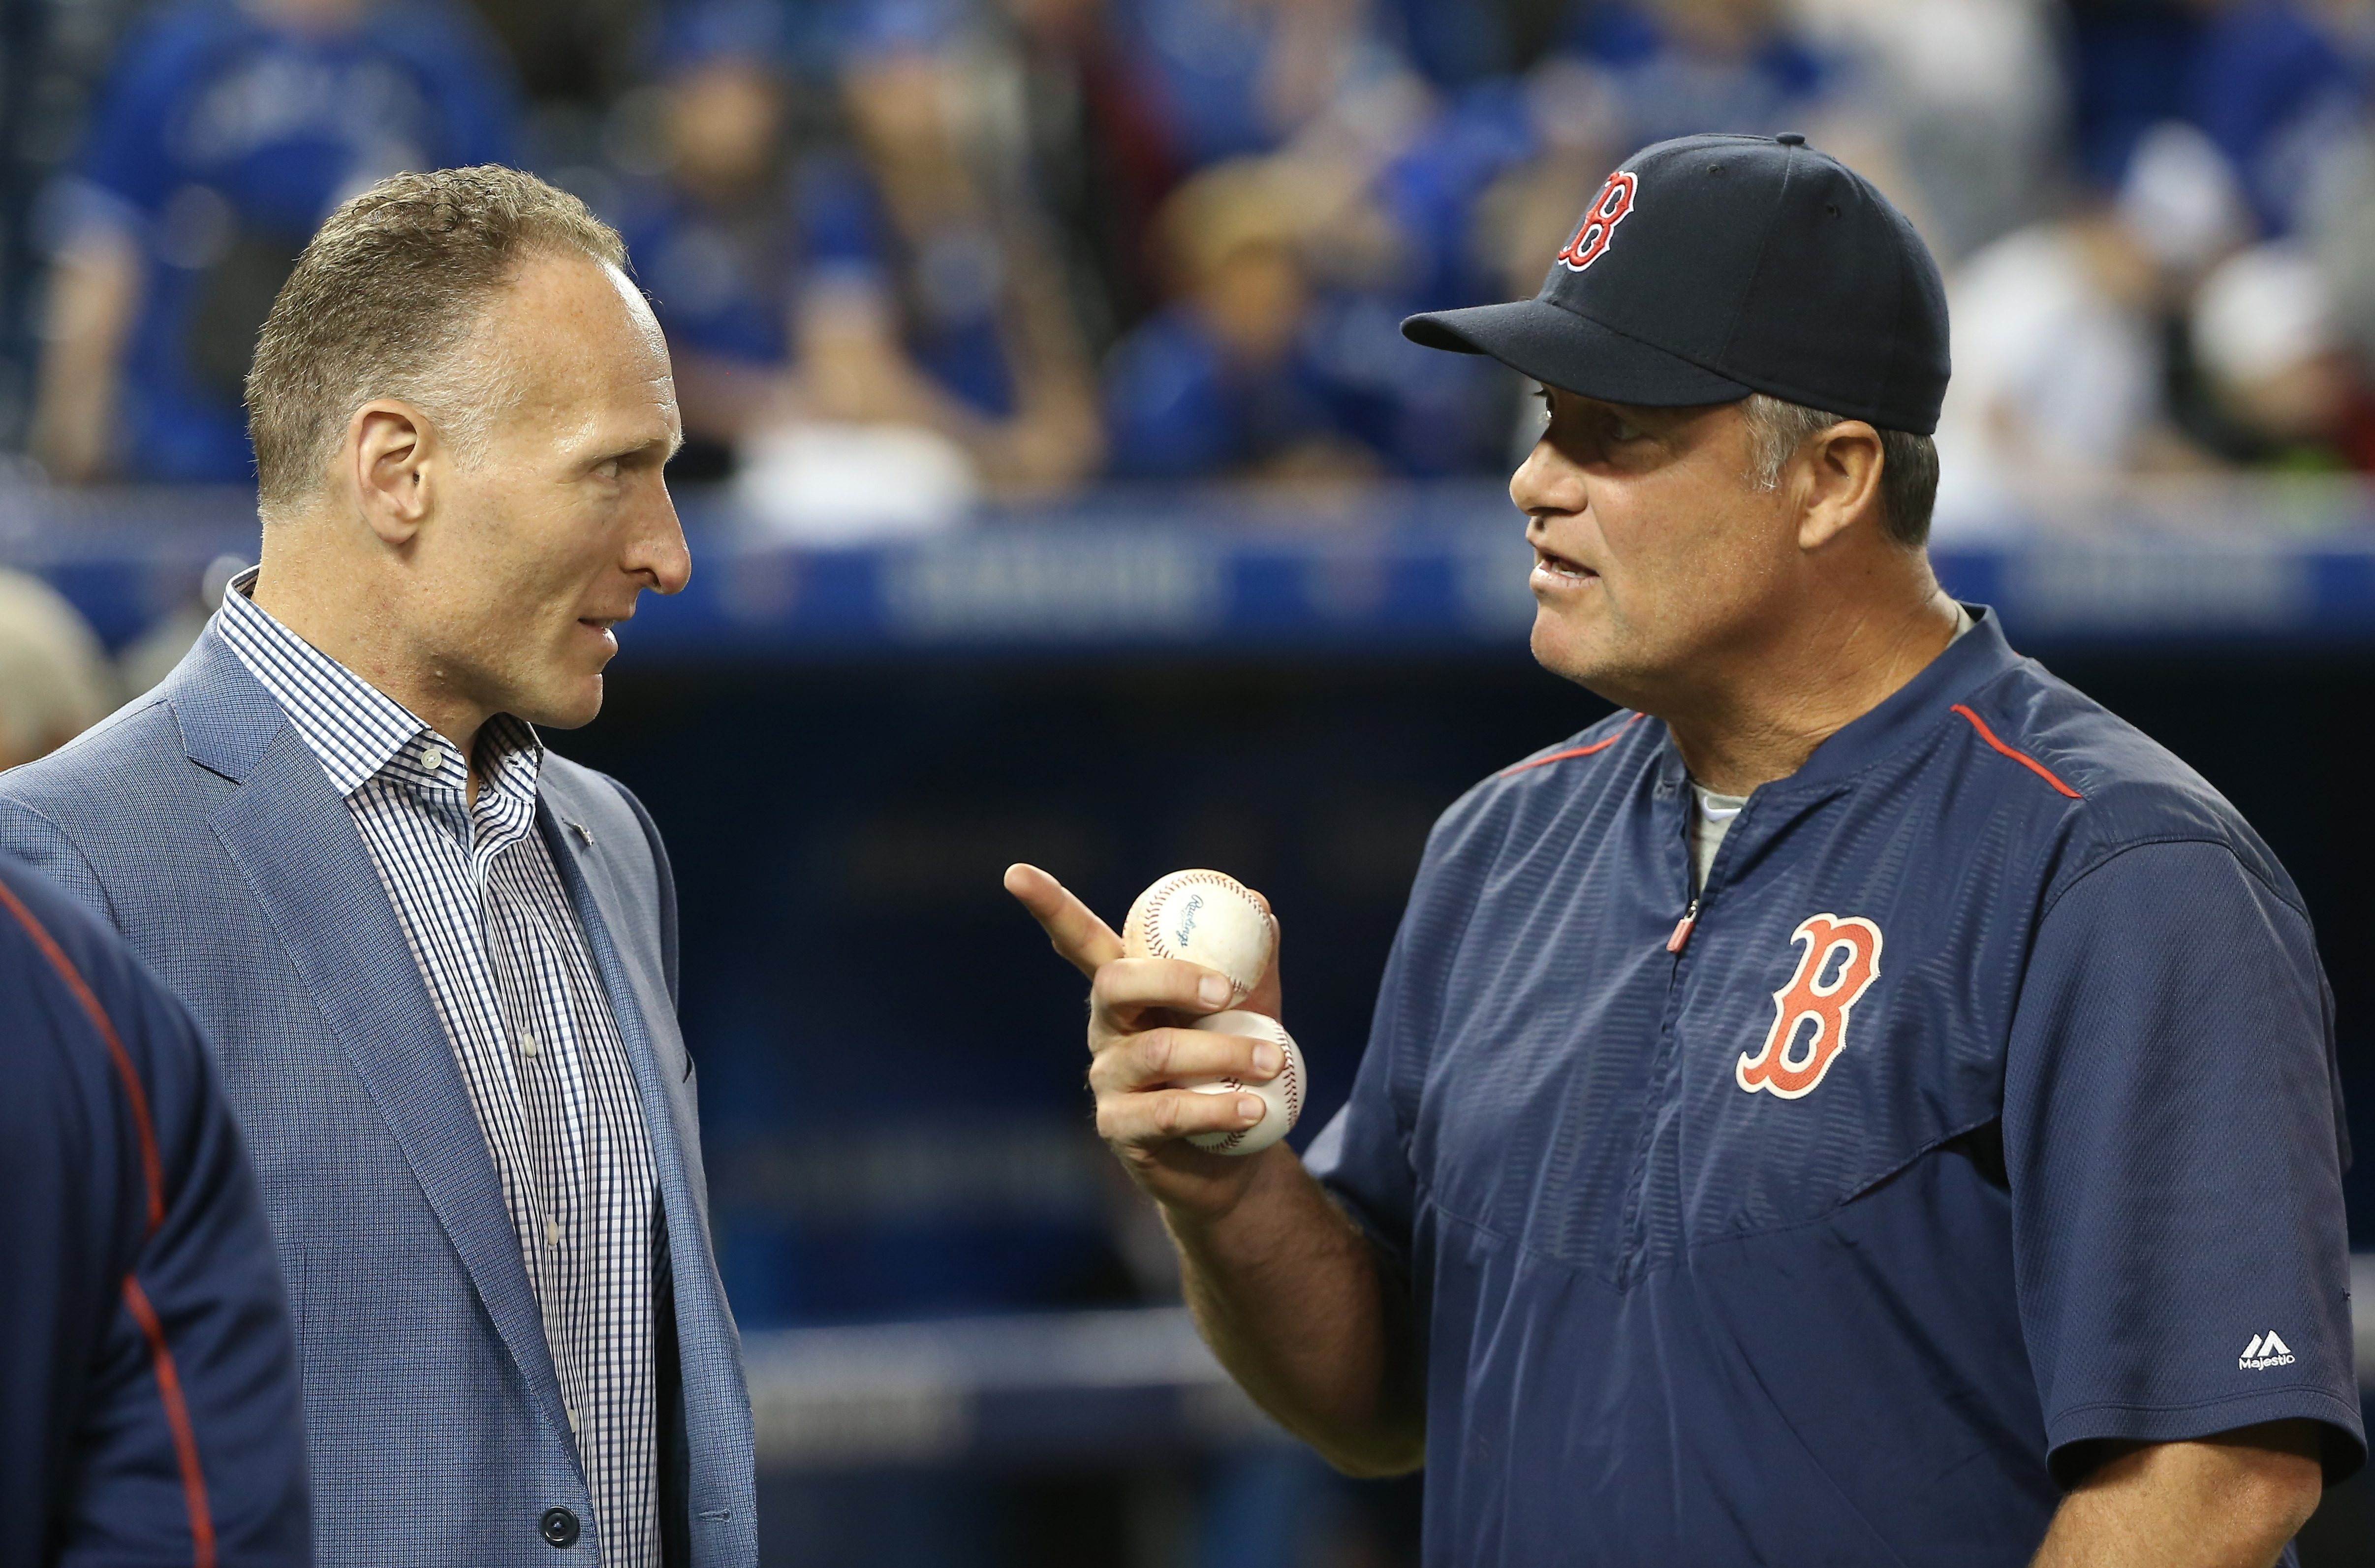 Toronto Blue Jays President and CEO Mark Shapiro talks to manager John Farrell of the Red Sox Friday.